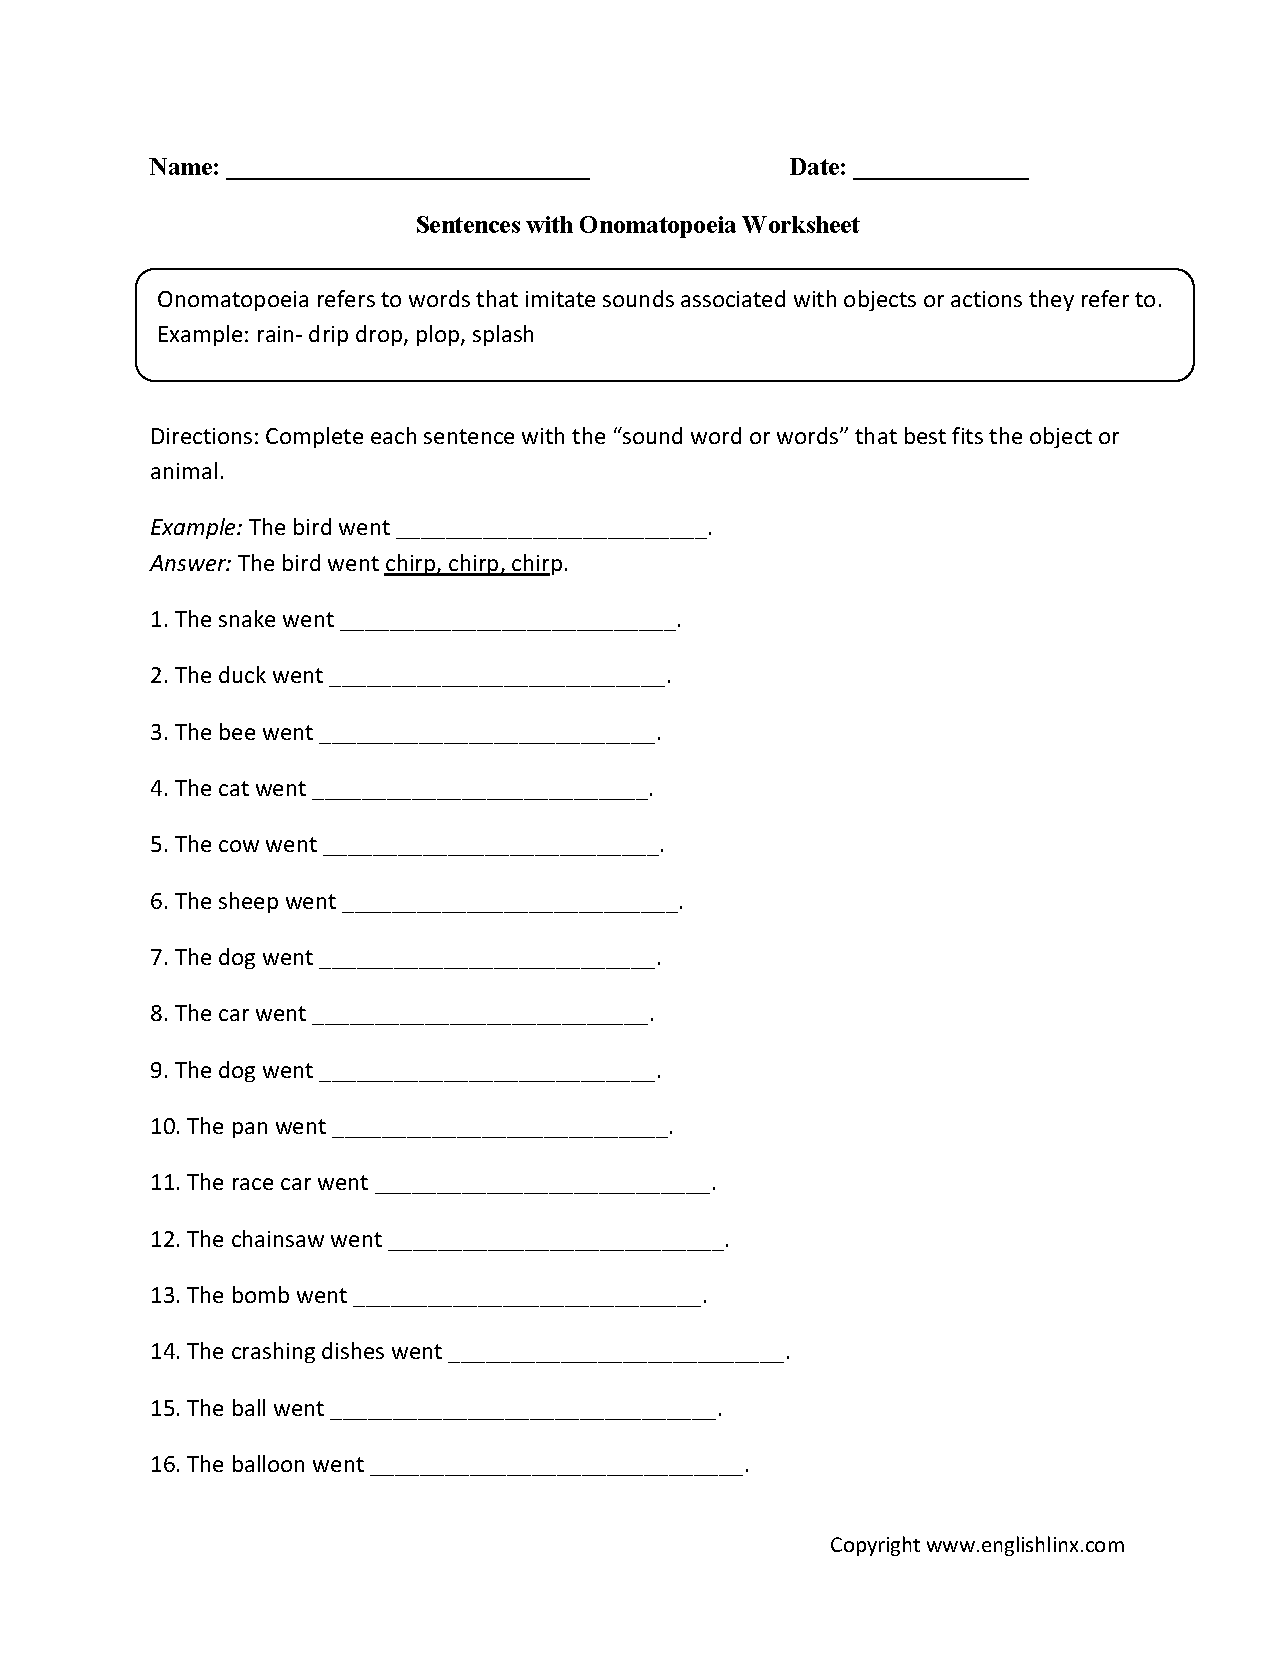 medium resolution of Onomatopoeia Worksheets   Sentences with Onomatopoeia Worksheet    Onomatopoeia